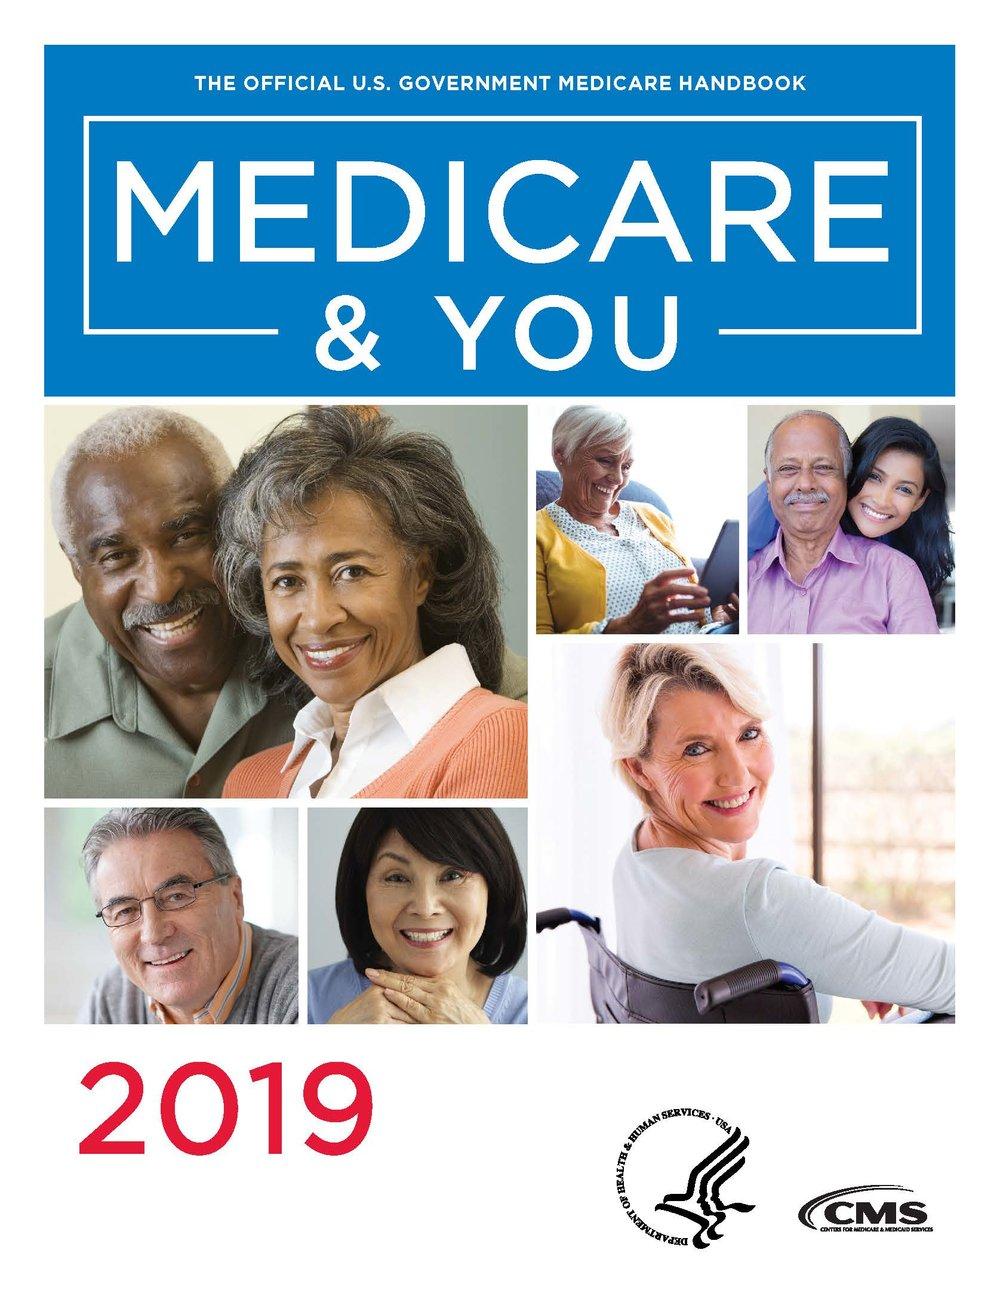 Medicare & You 2019 CMS.jpg